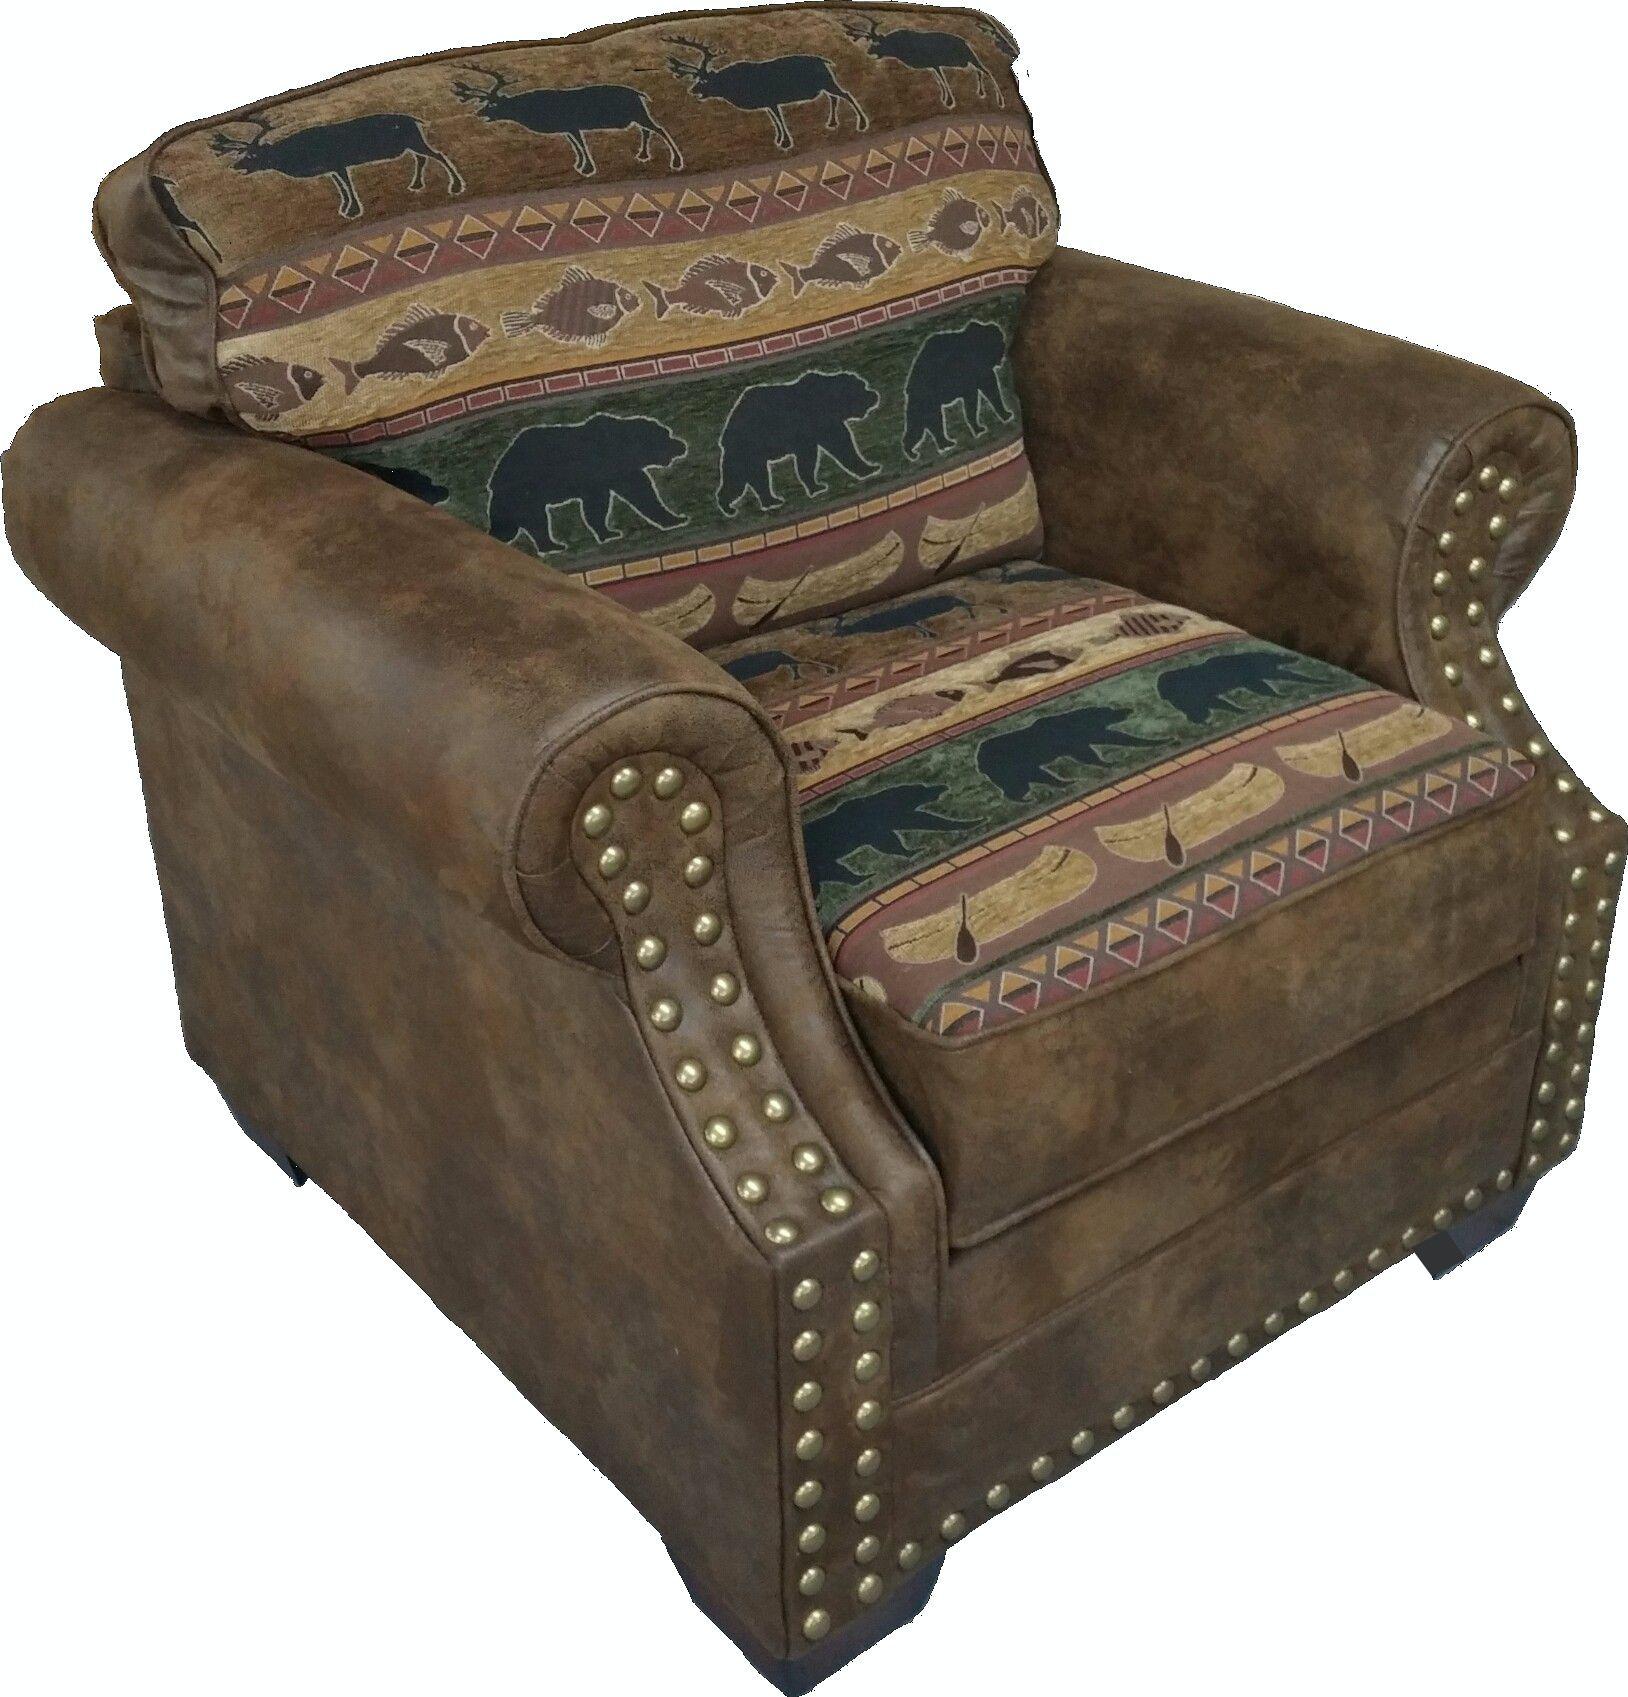 Superb Bayne Rustic Chair 930 1 DVA/PT